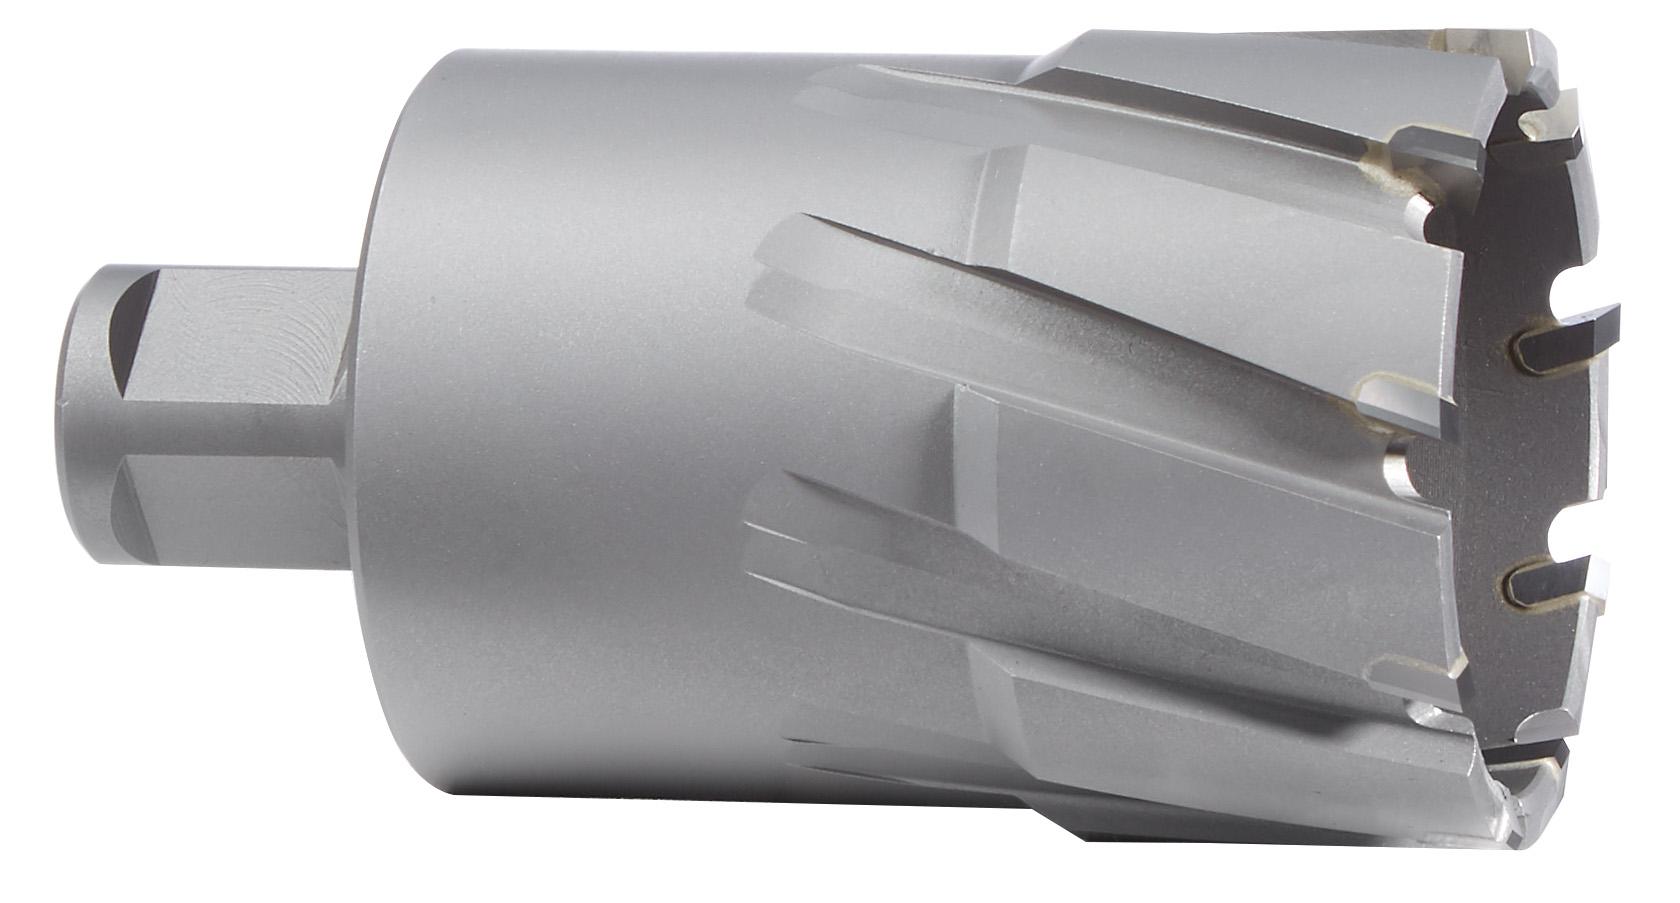 Milwaukee® 49-59-4188 Annular Cutter, 1-7/8 in Dia Cutter, 2 in D Cutting, Weld-On Shank